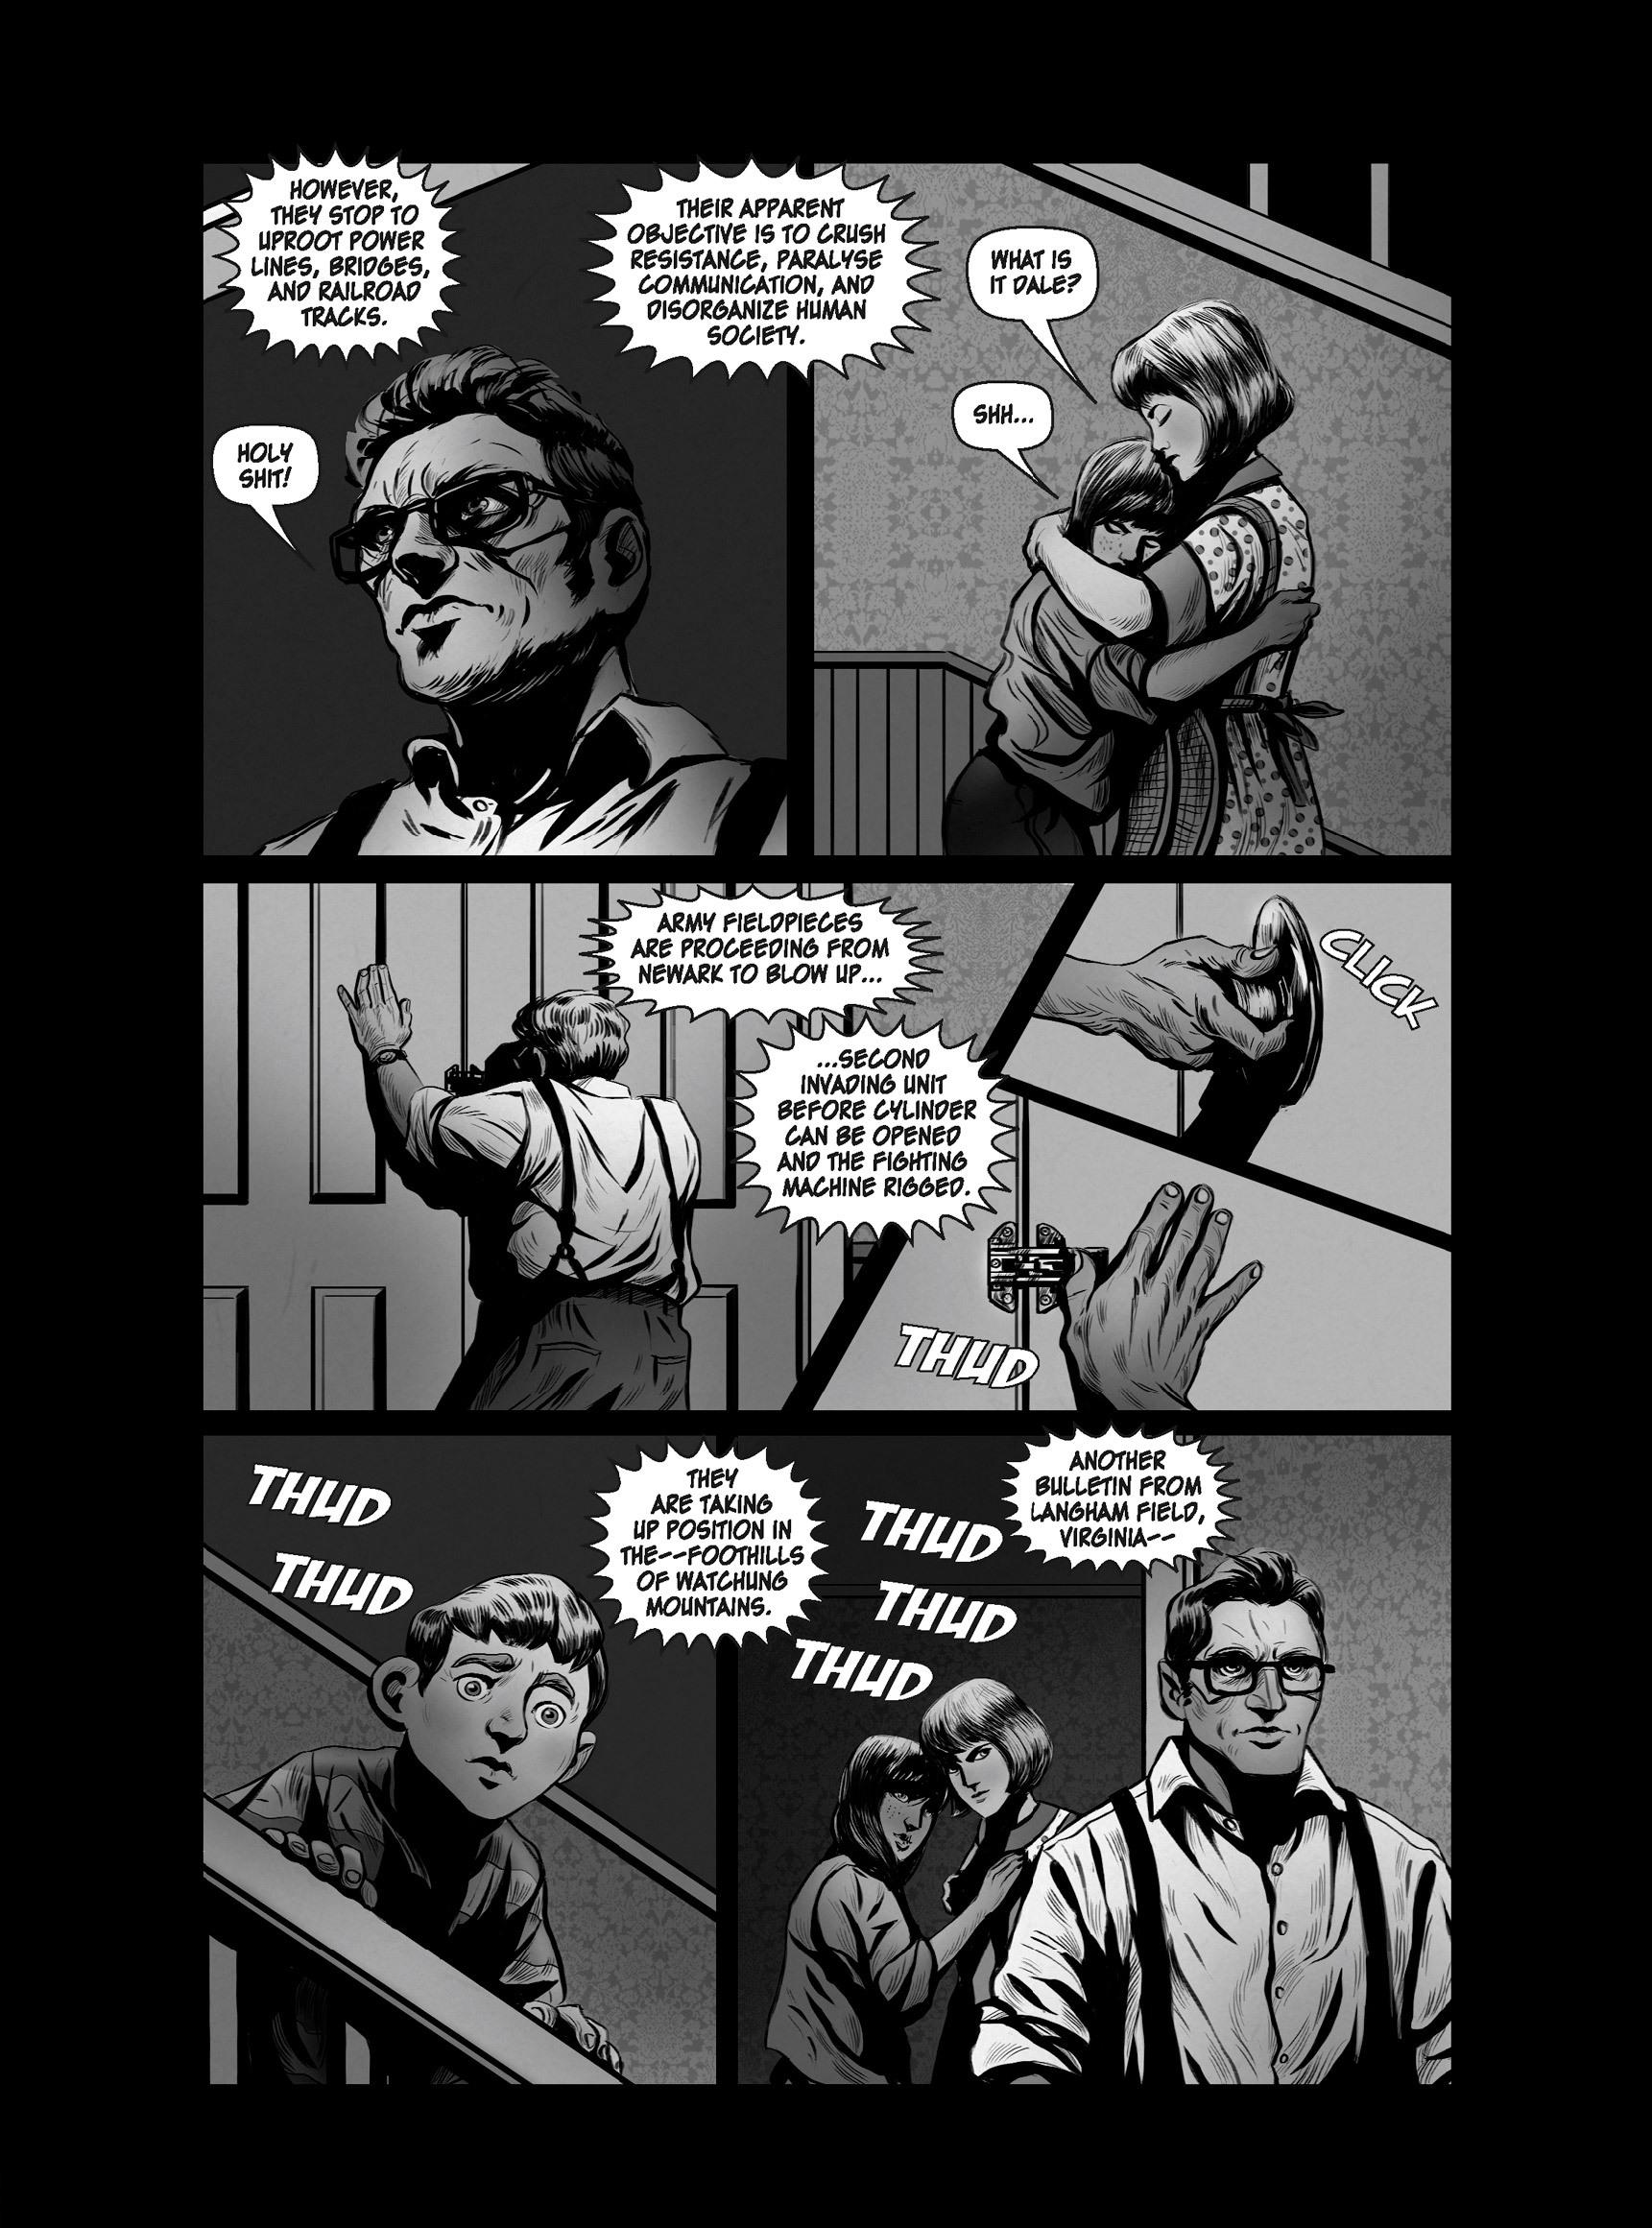 Read online FUBAR comic -  Issue #3 - 256